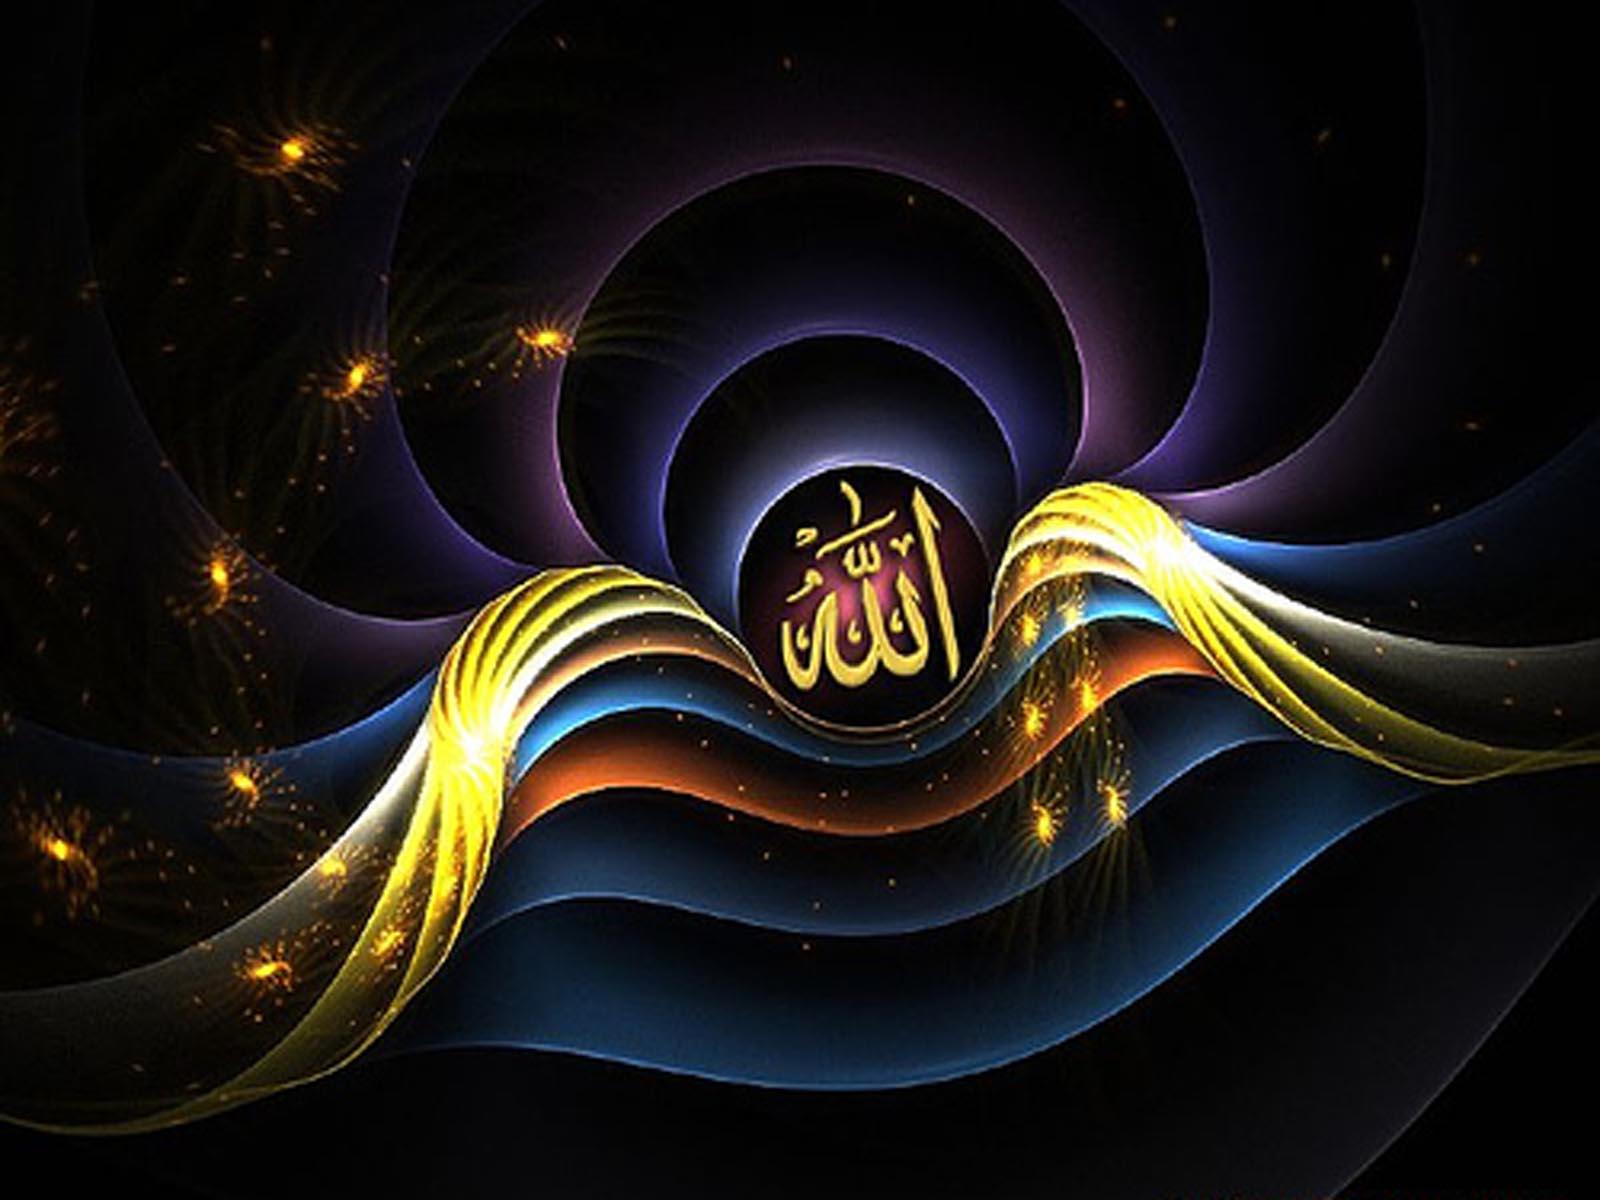 Allah HD Wallpaper 1600x1200